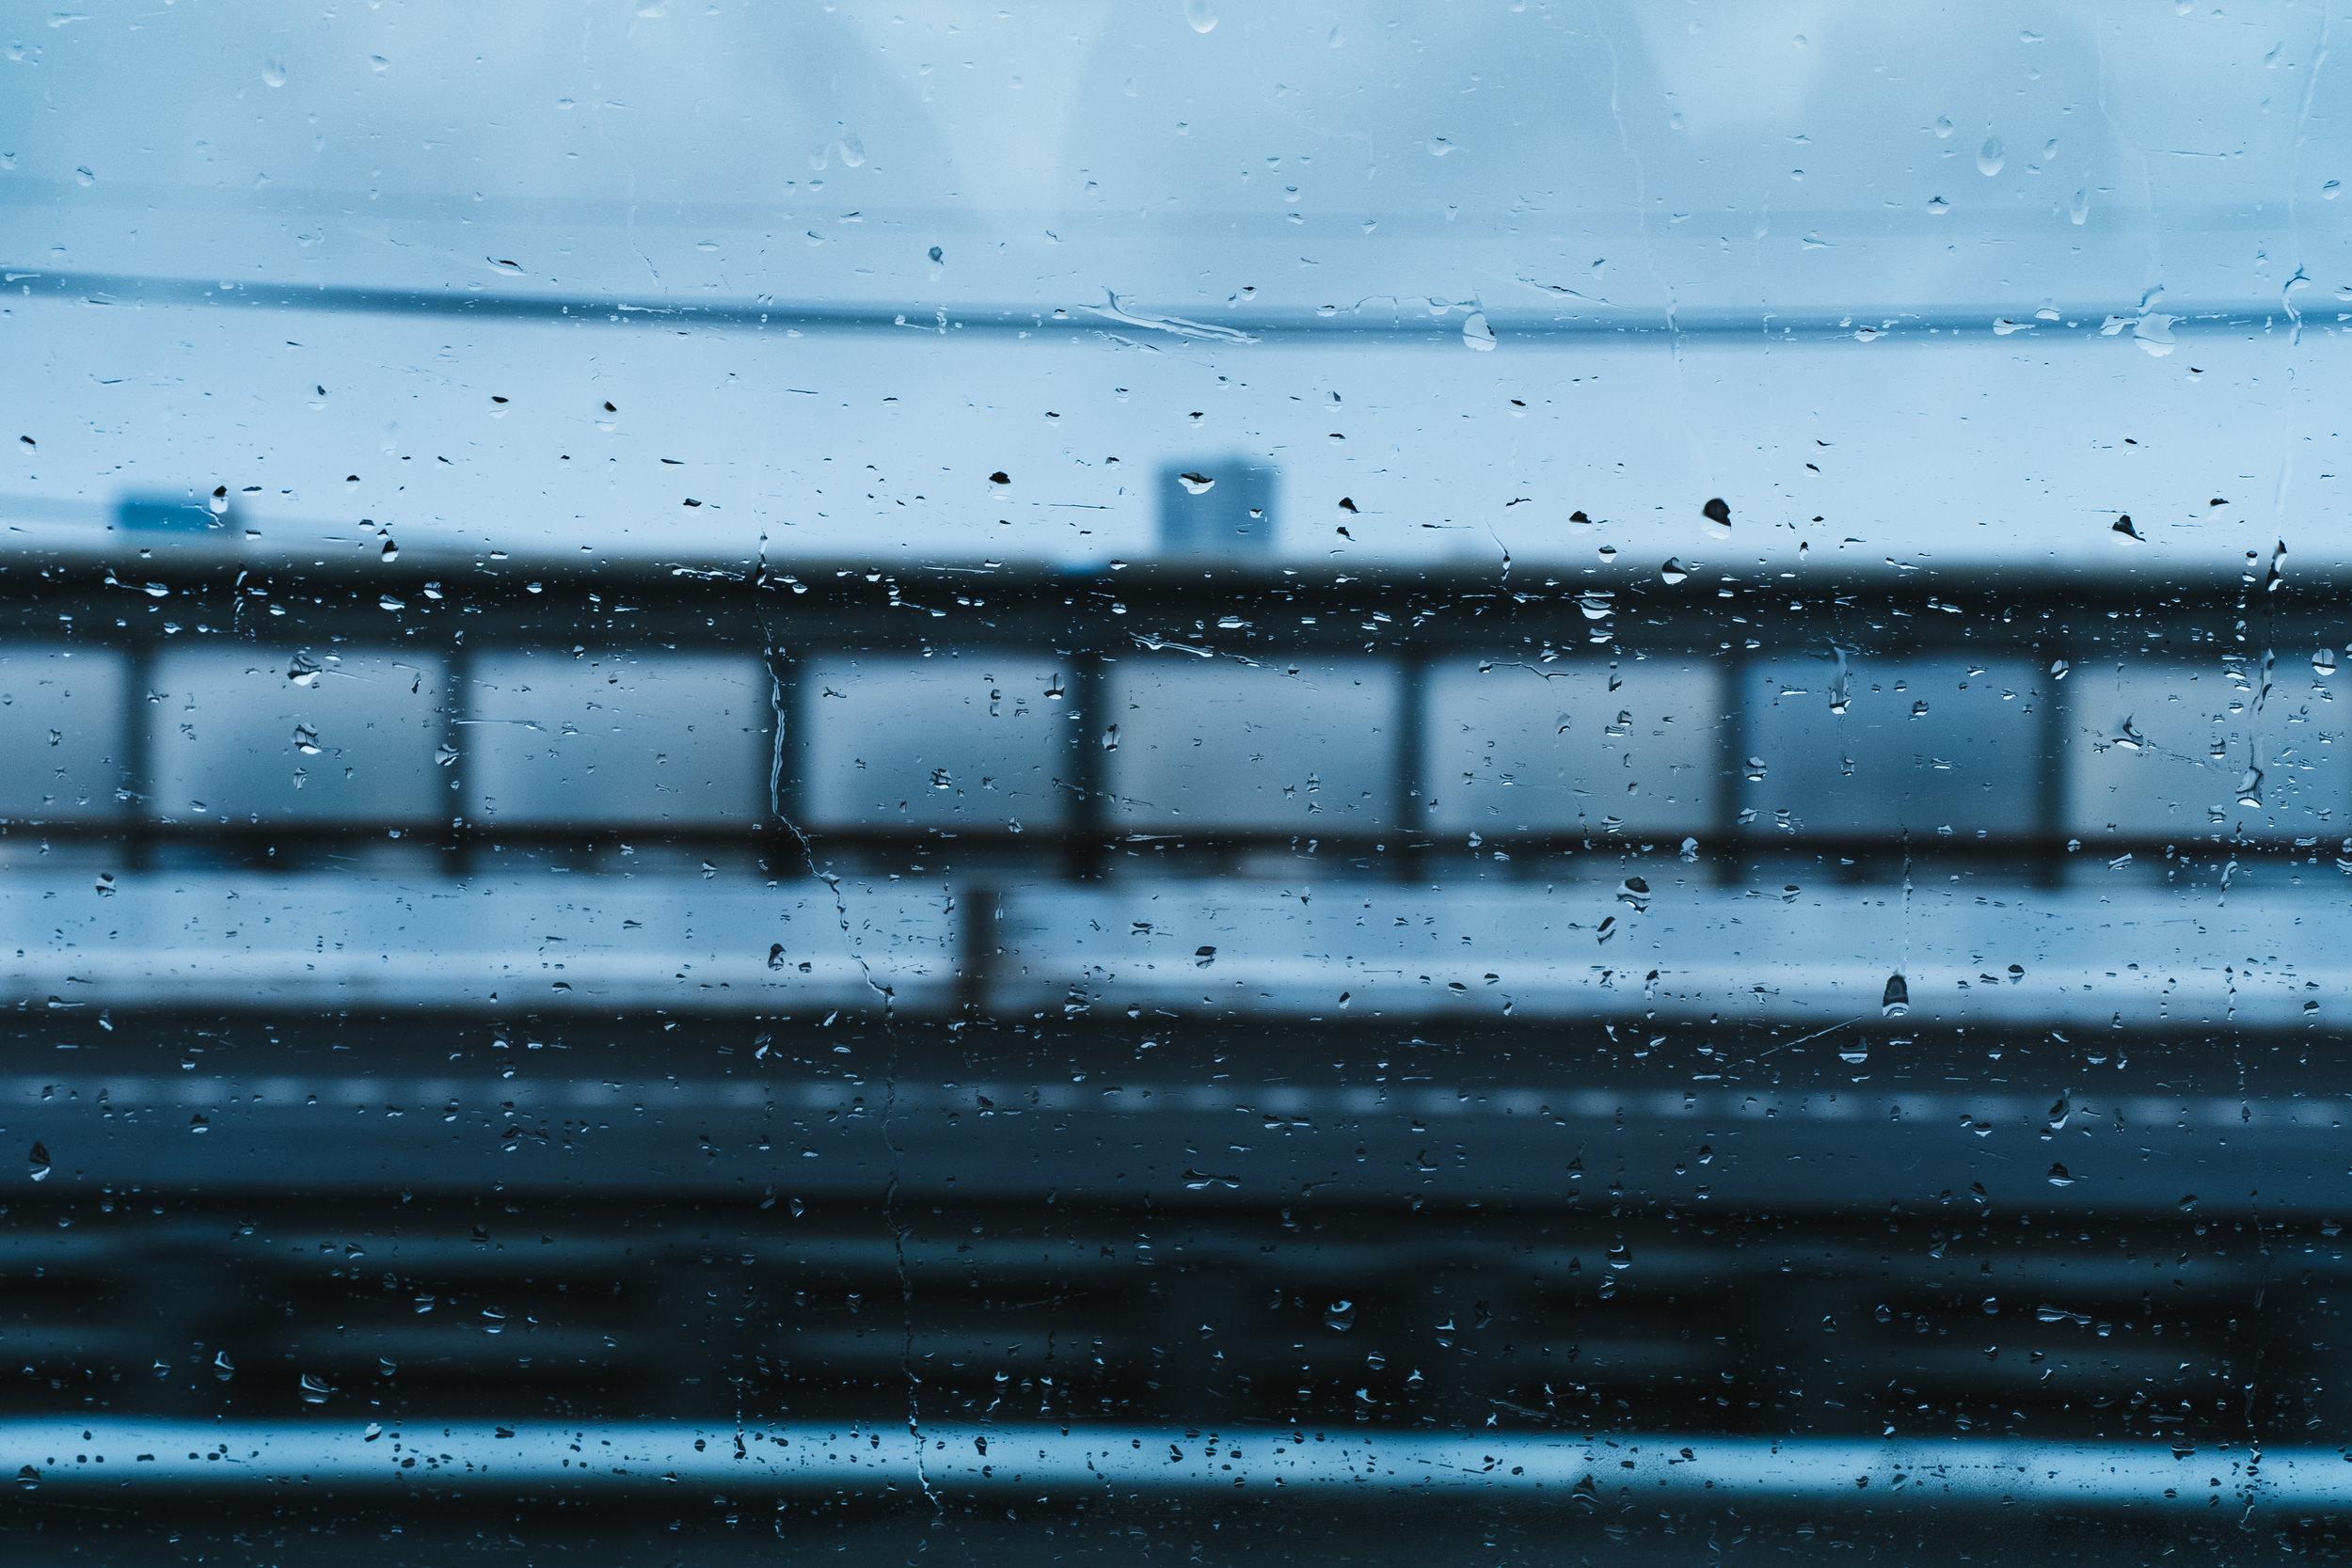 rainy-highway.jpg